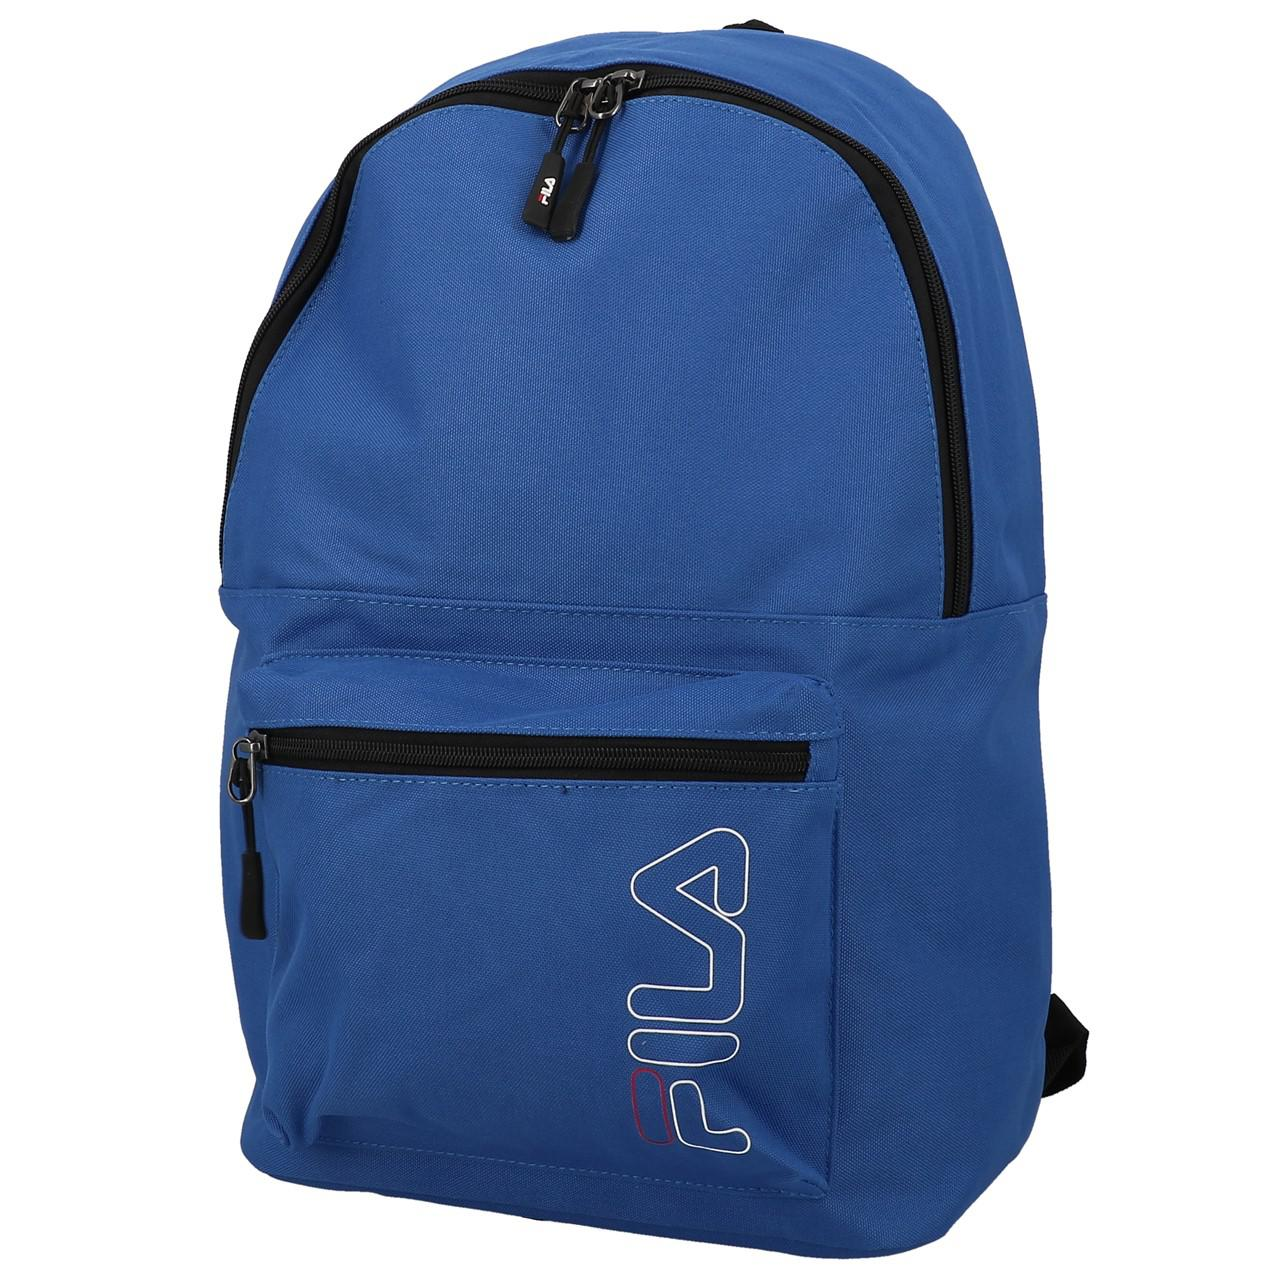 Sac-a-dos-college-Fila-Backpack-sxcool-bleu-Bleu-48131-Neuf